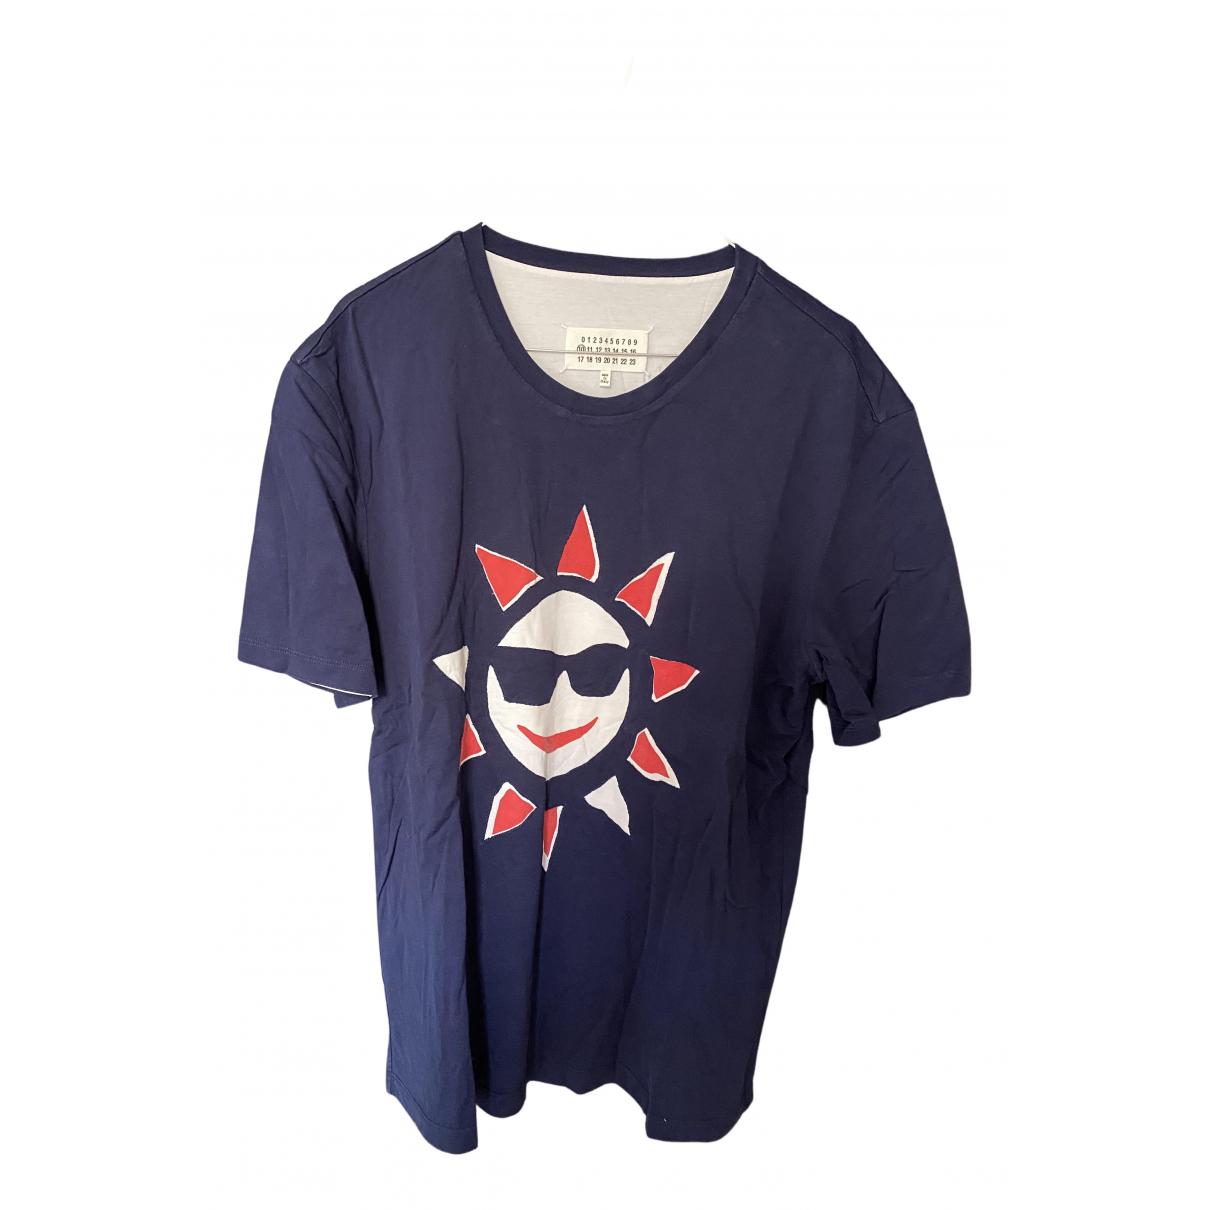 Maison Martin Margiela - Tee shirts   pour homme en coton - marine